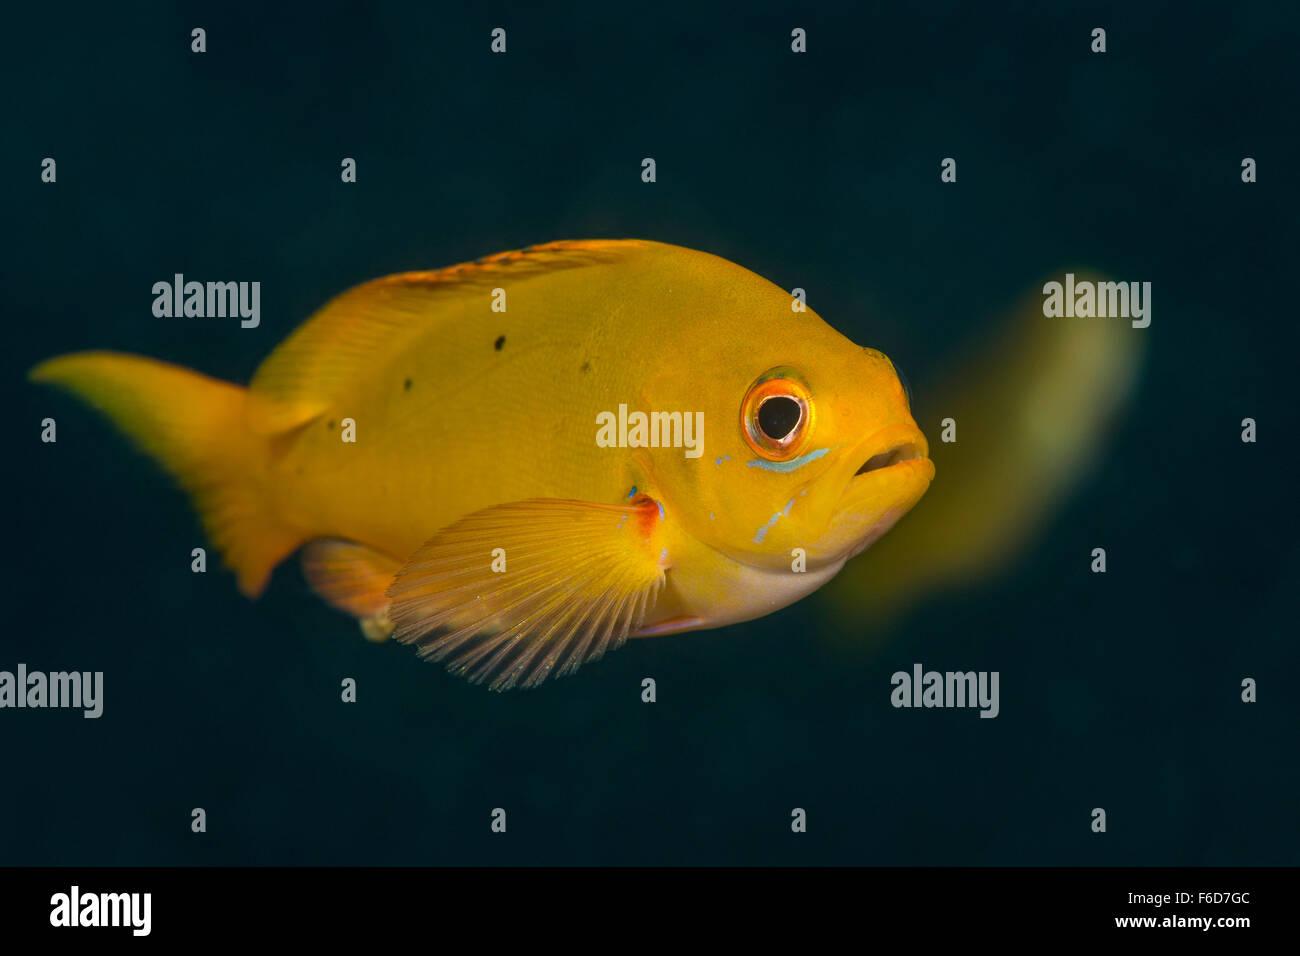 Pacífico menores Creolefish, Paranthias colonus, La Paz, Baja California Sur, México Imagen De Stock